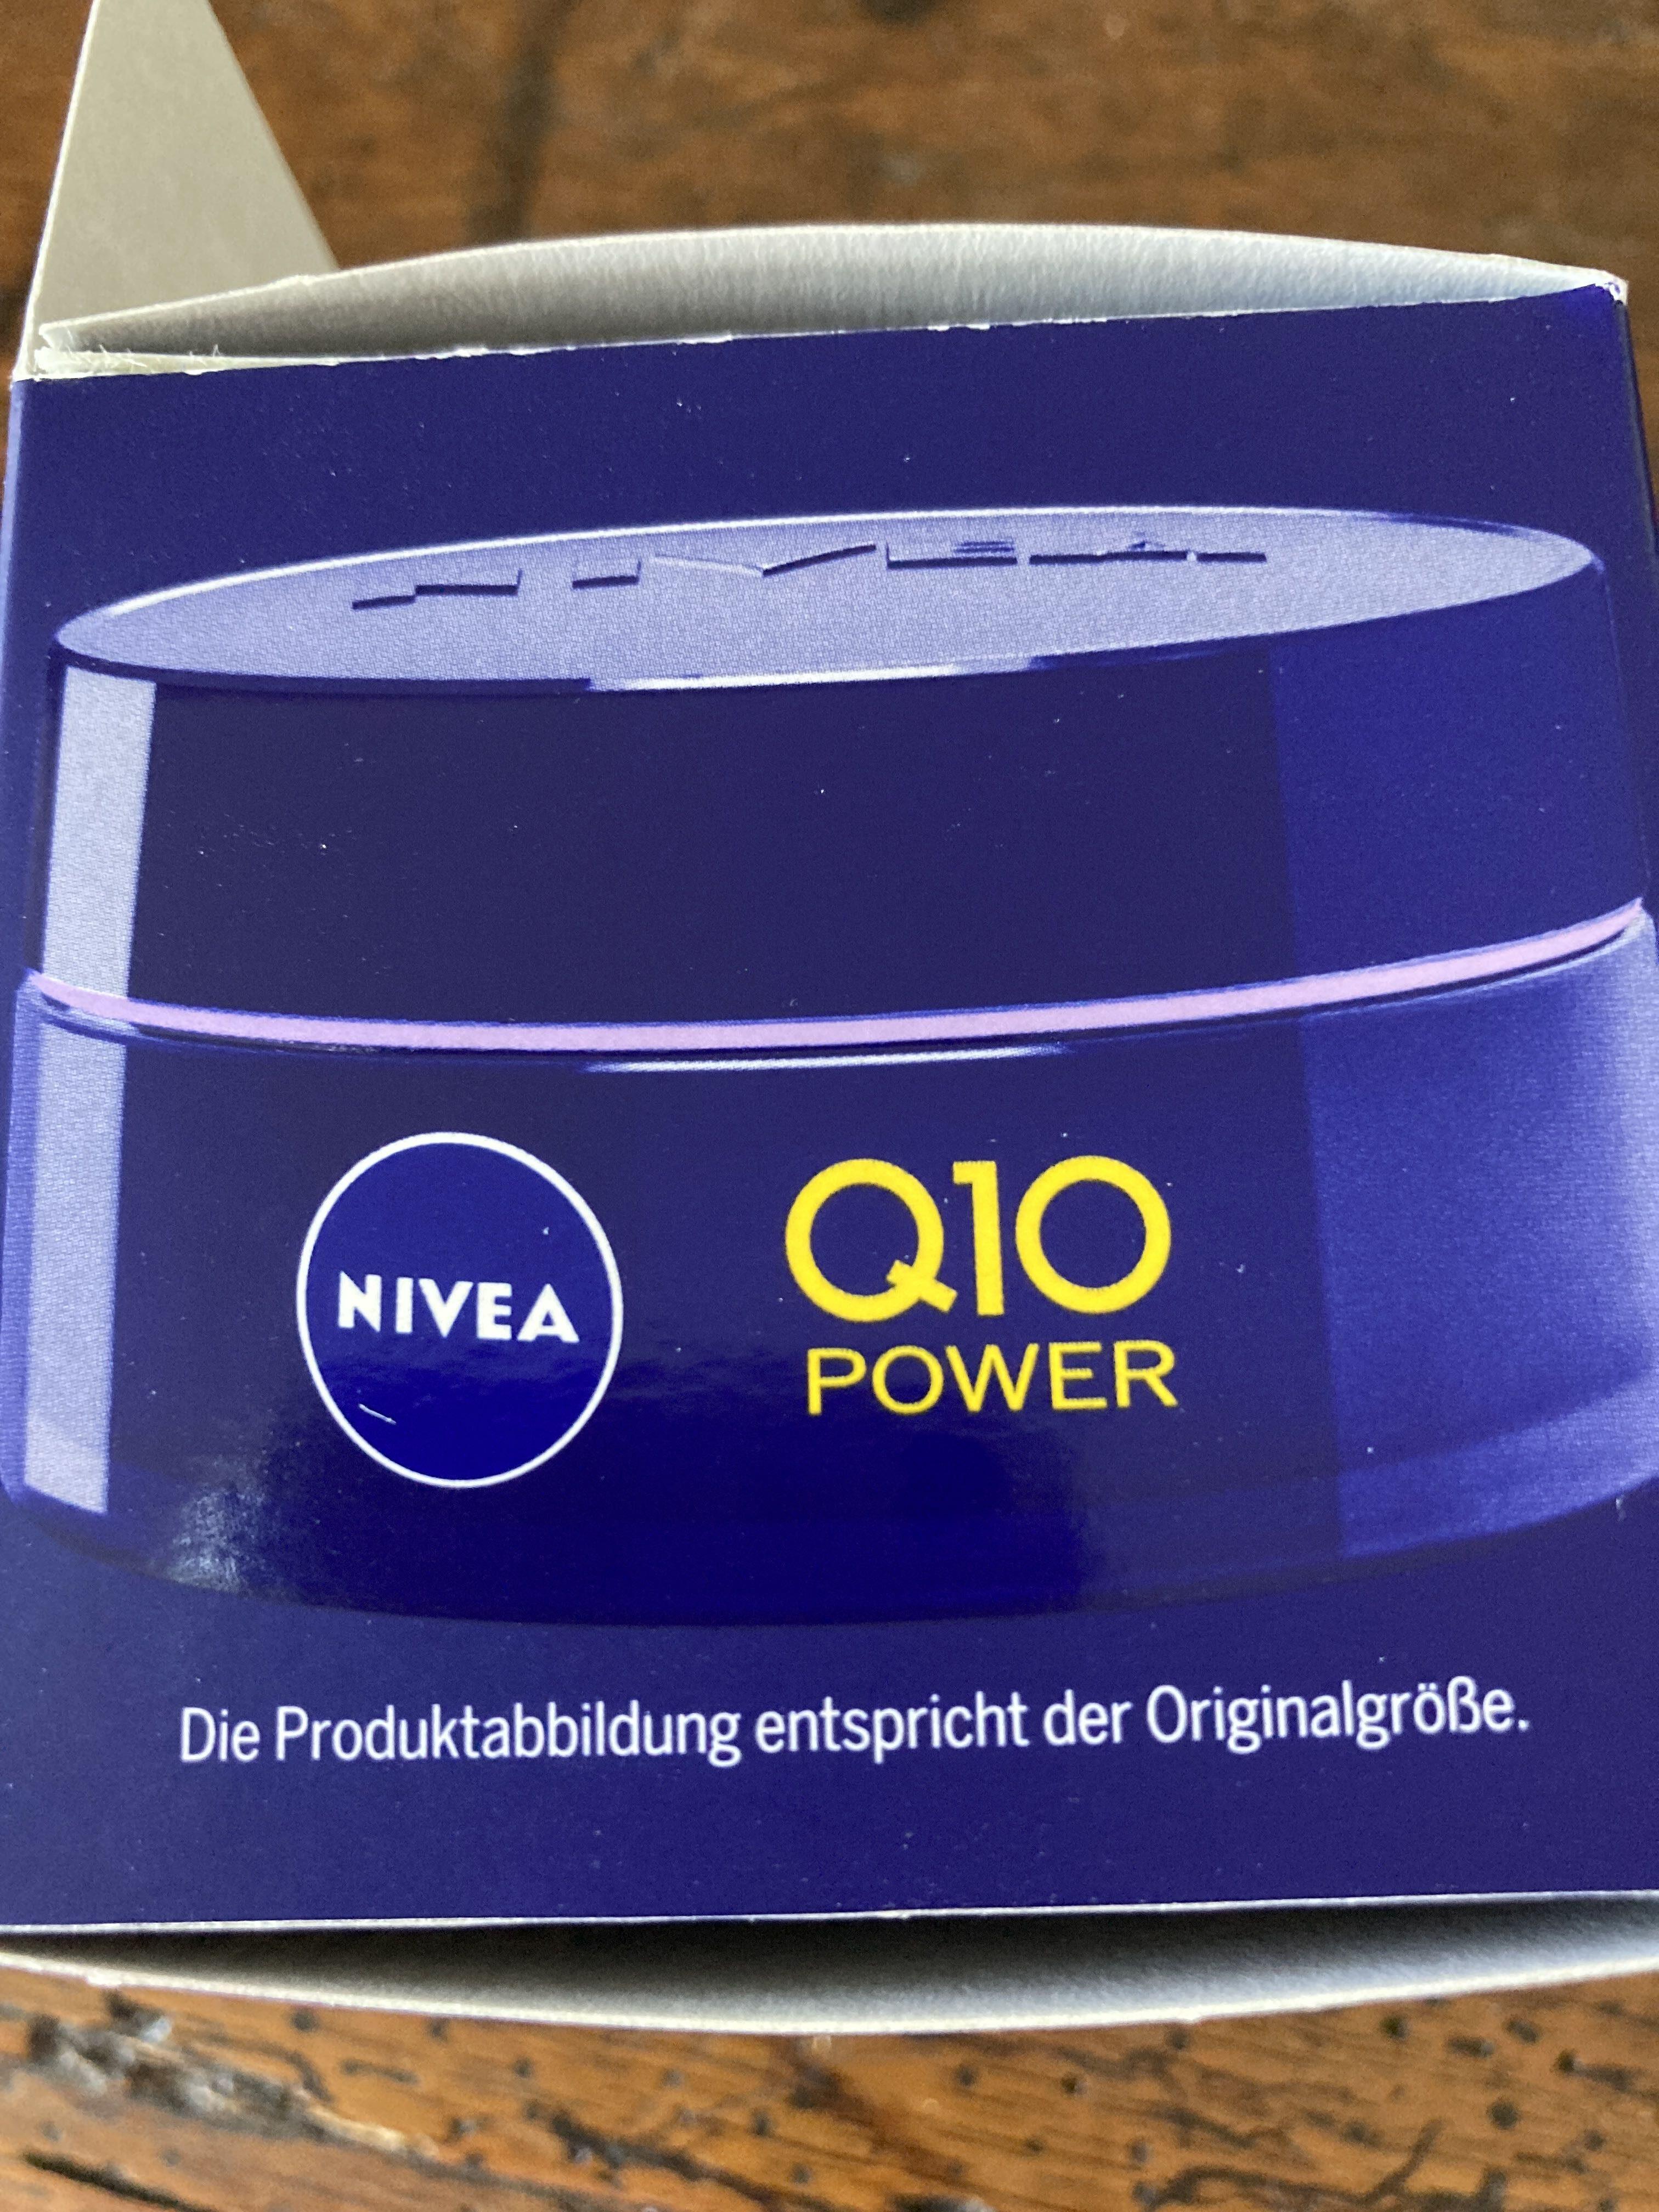 Nivea Q10 Power - Product - fr